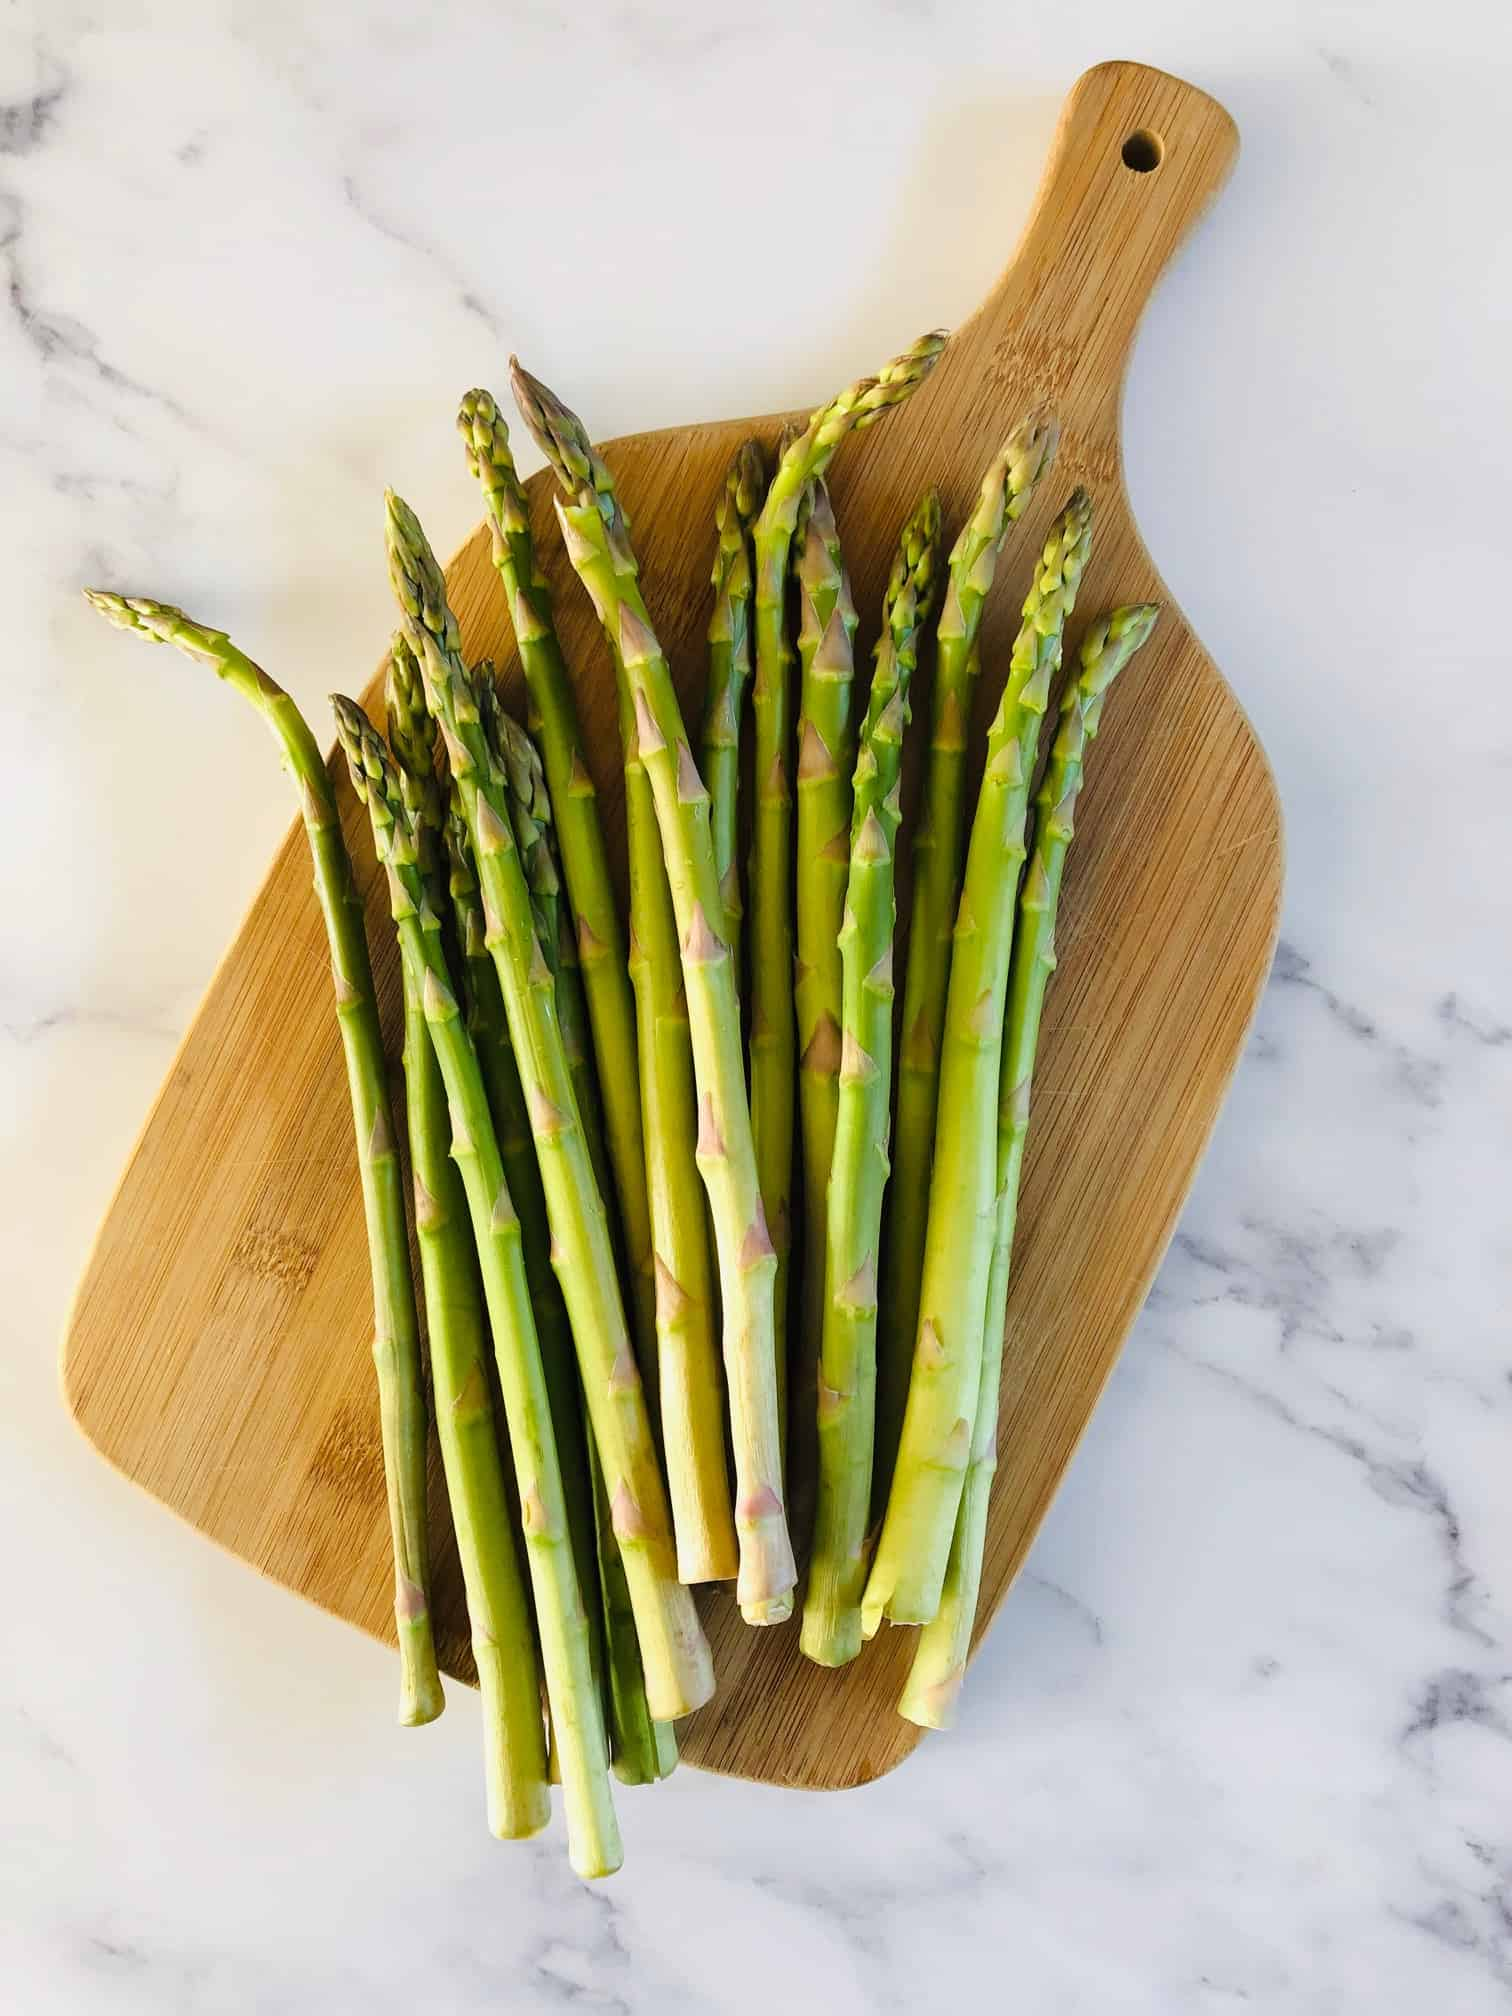 raw asparagus on a chopping board